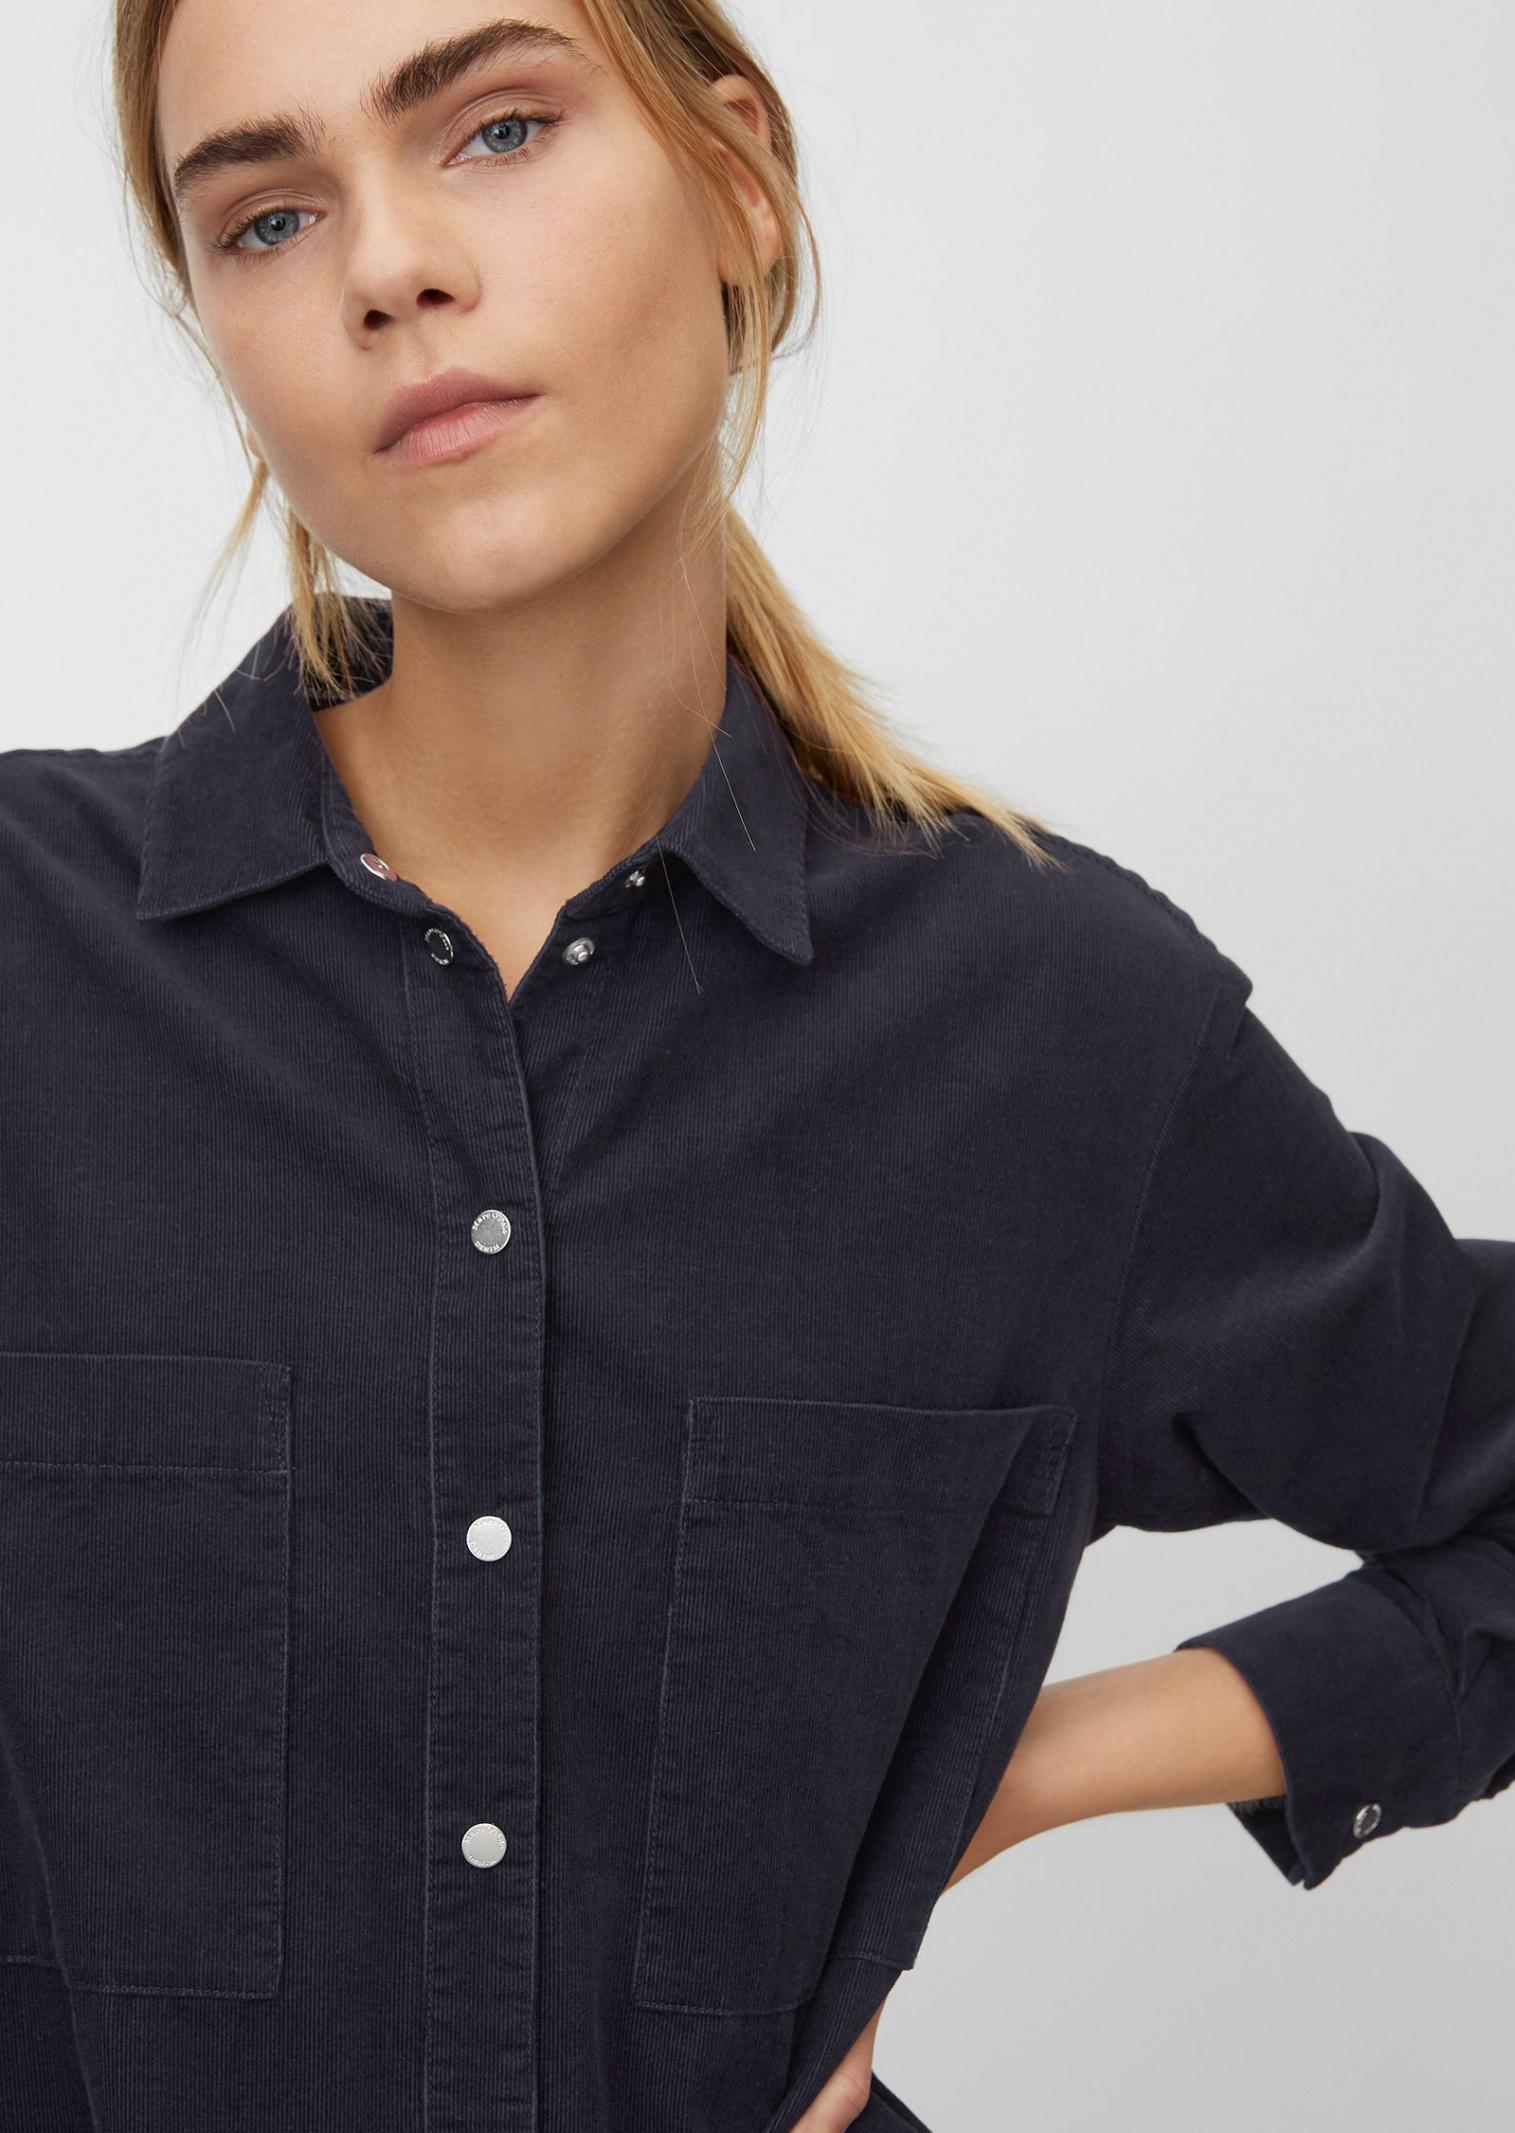 Платье женские MARC O'POLO DENIM модель PF3959 характеристики, 2017